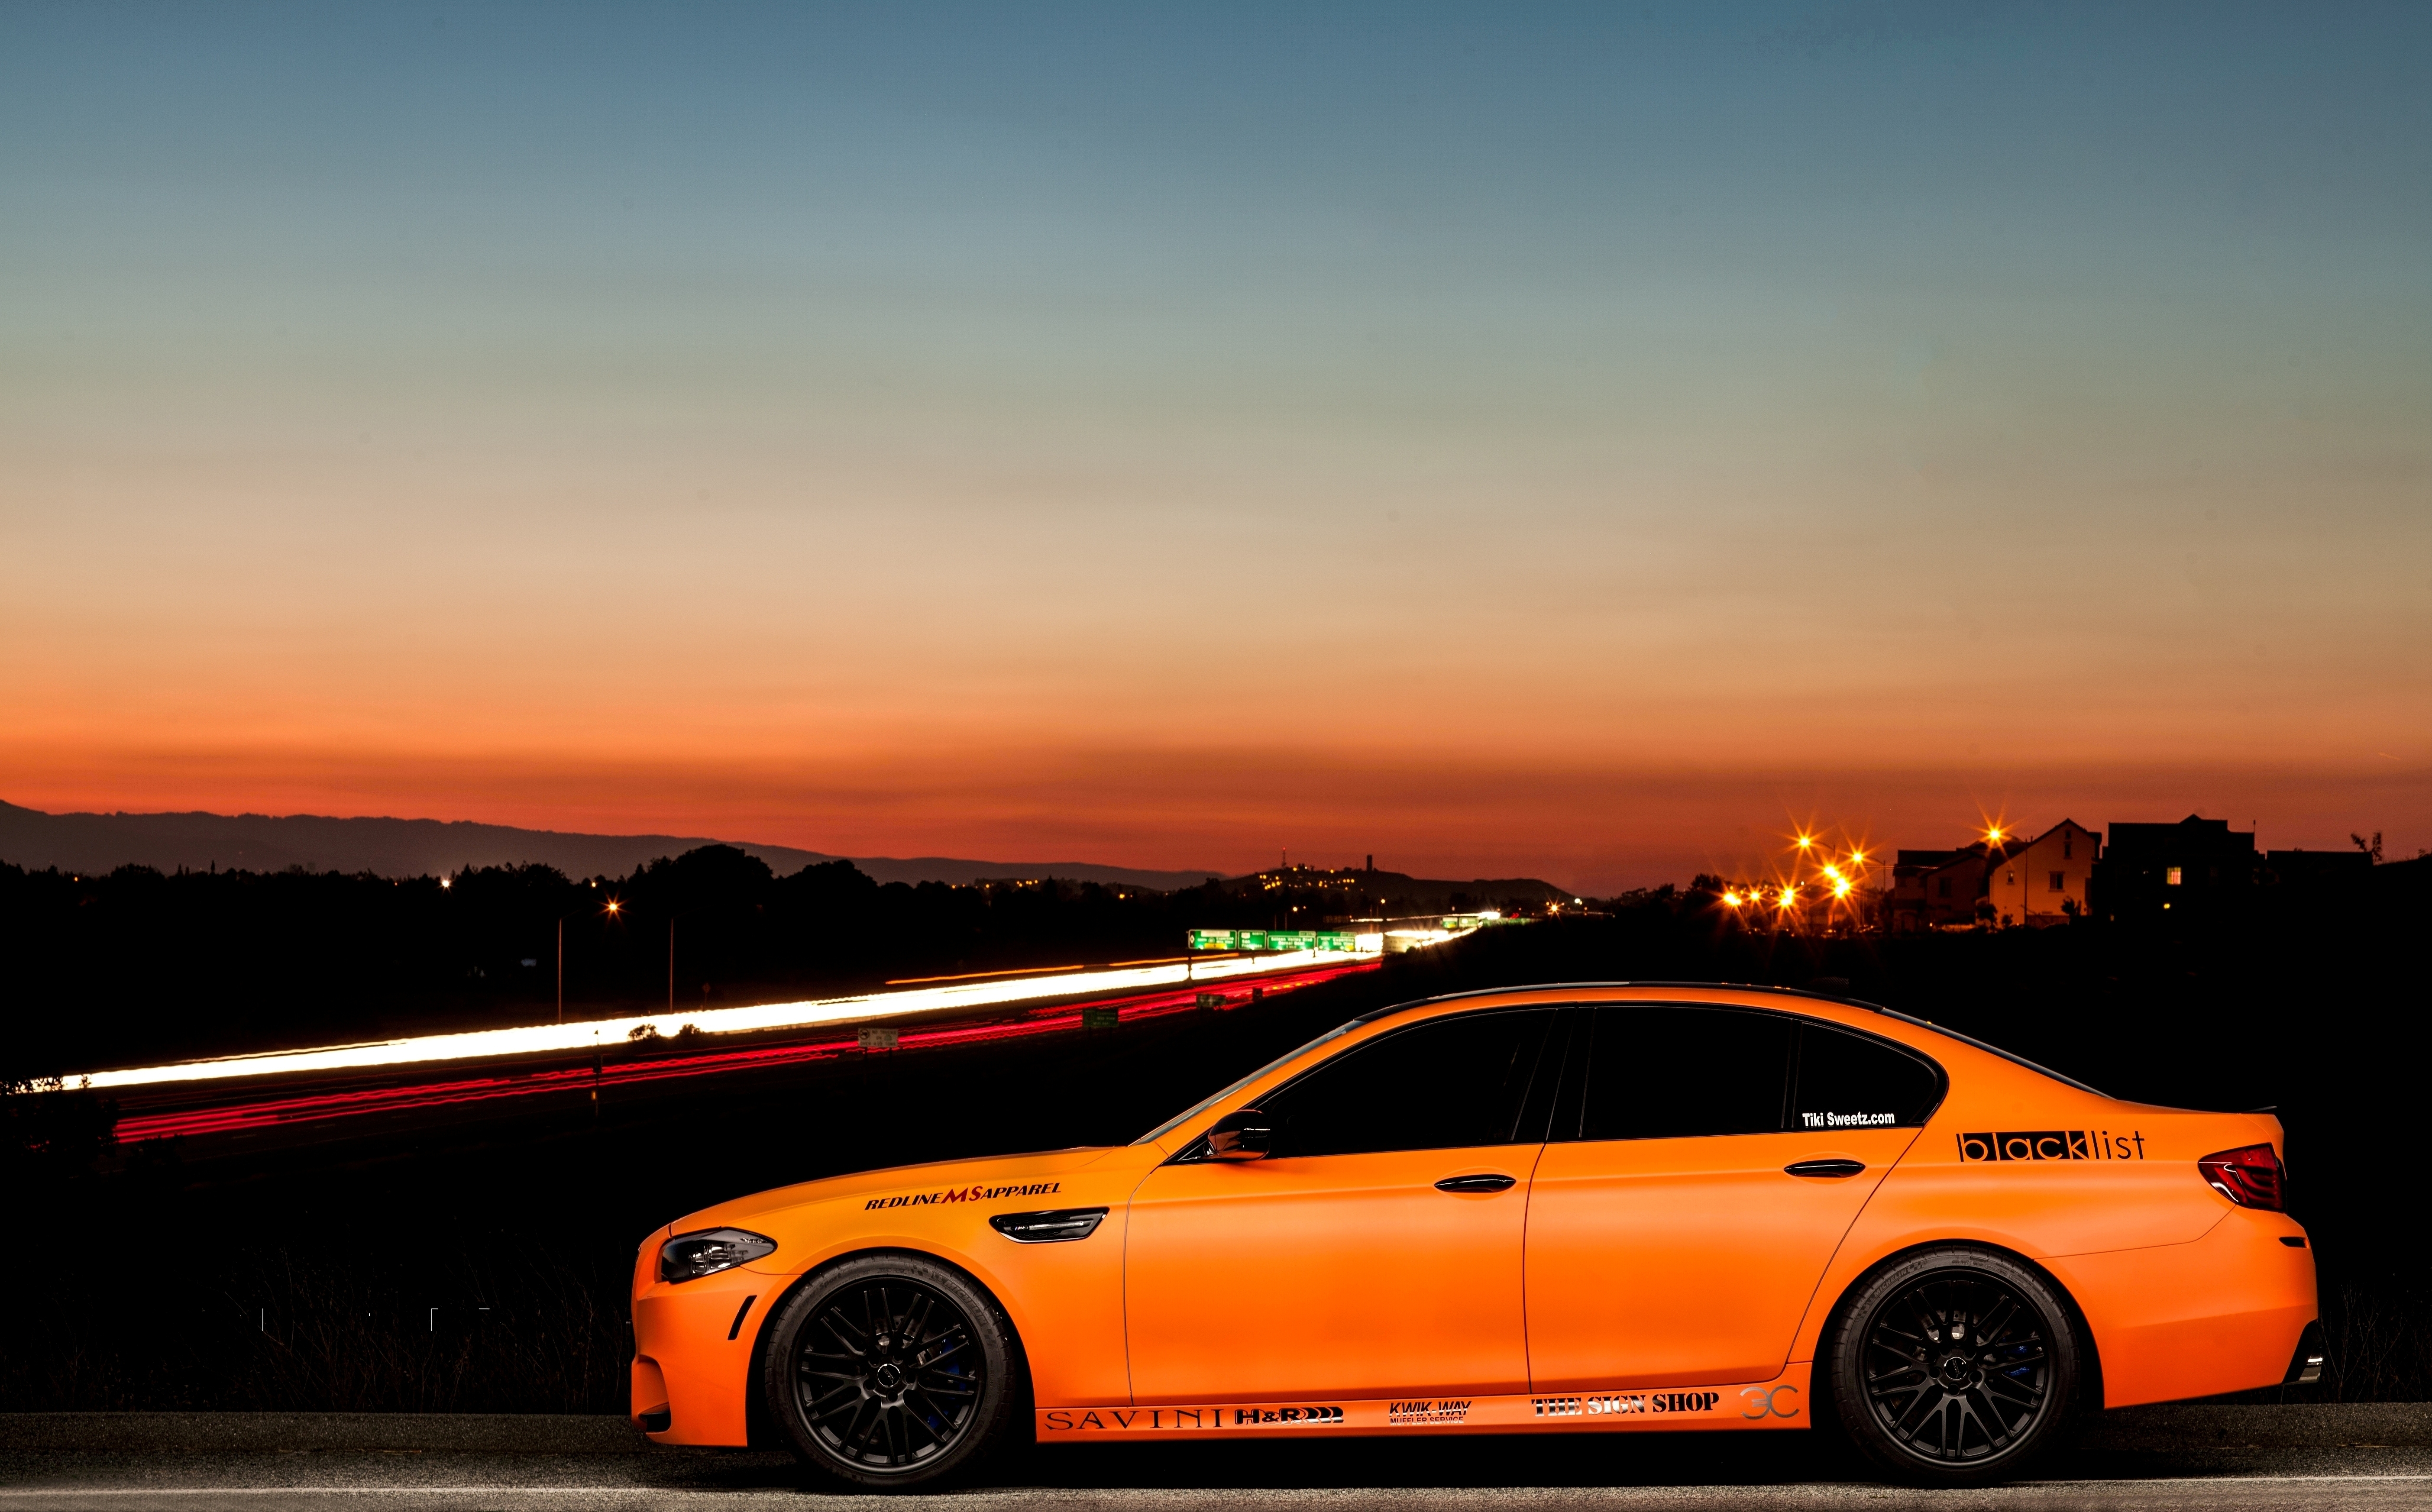 BMW перед оранжевая  № 843807 загрузить